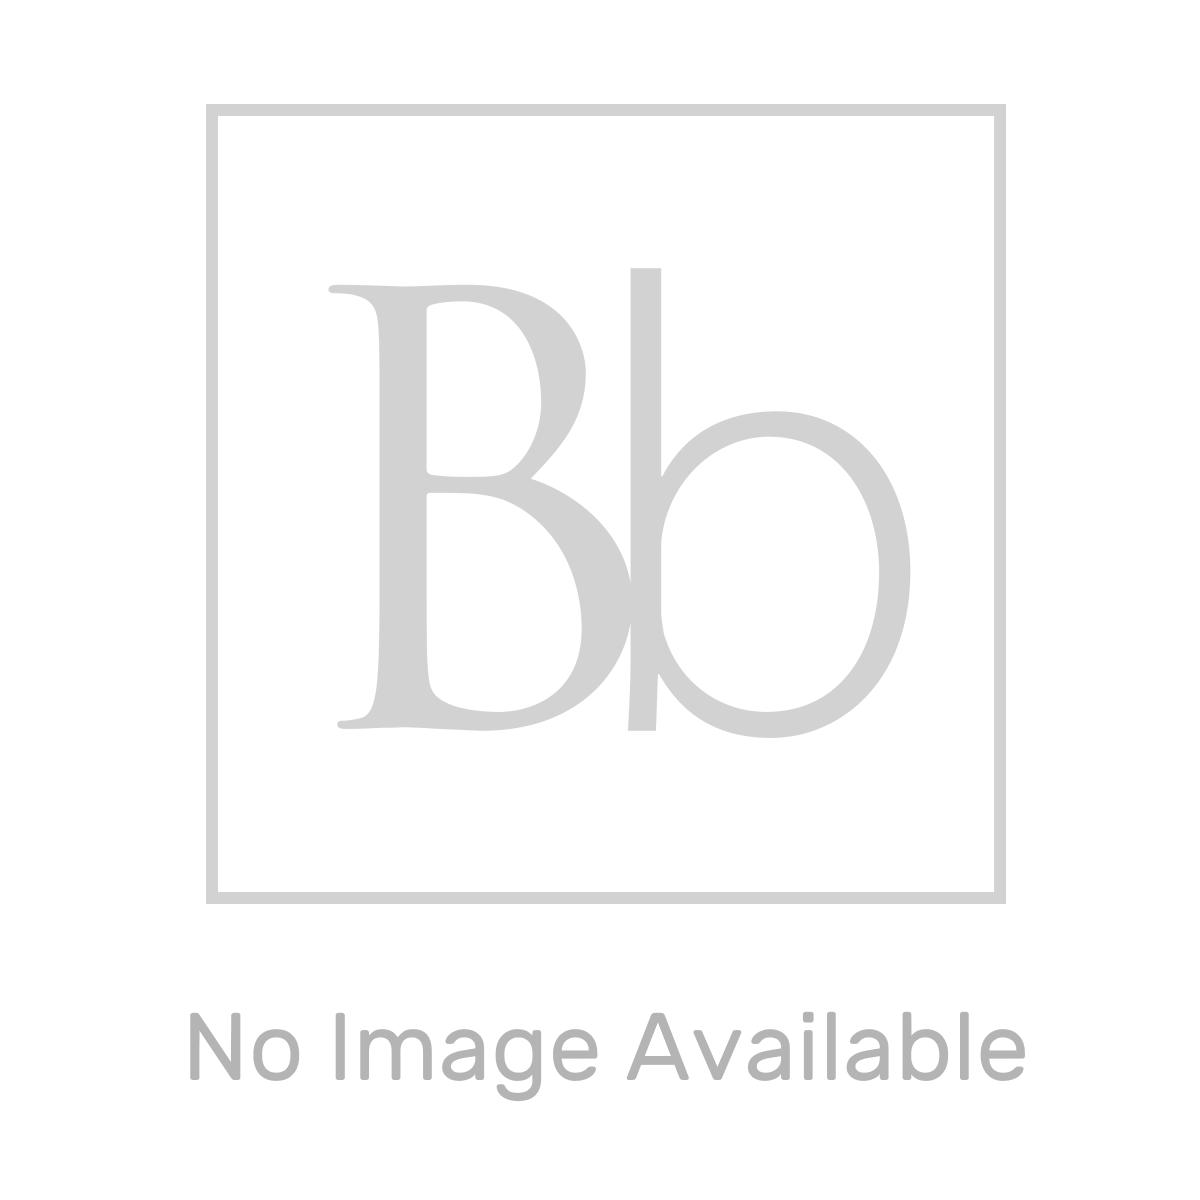 Aquadart Grey Slate Shower Tray 1200 x 800